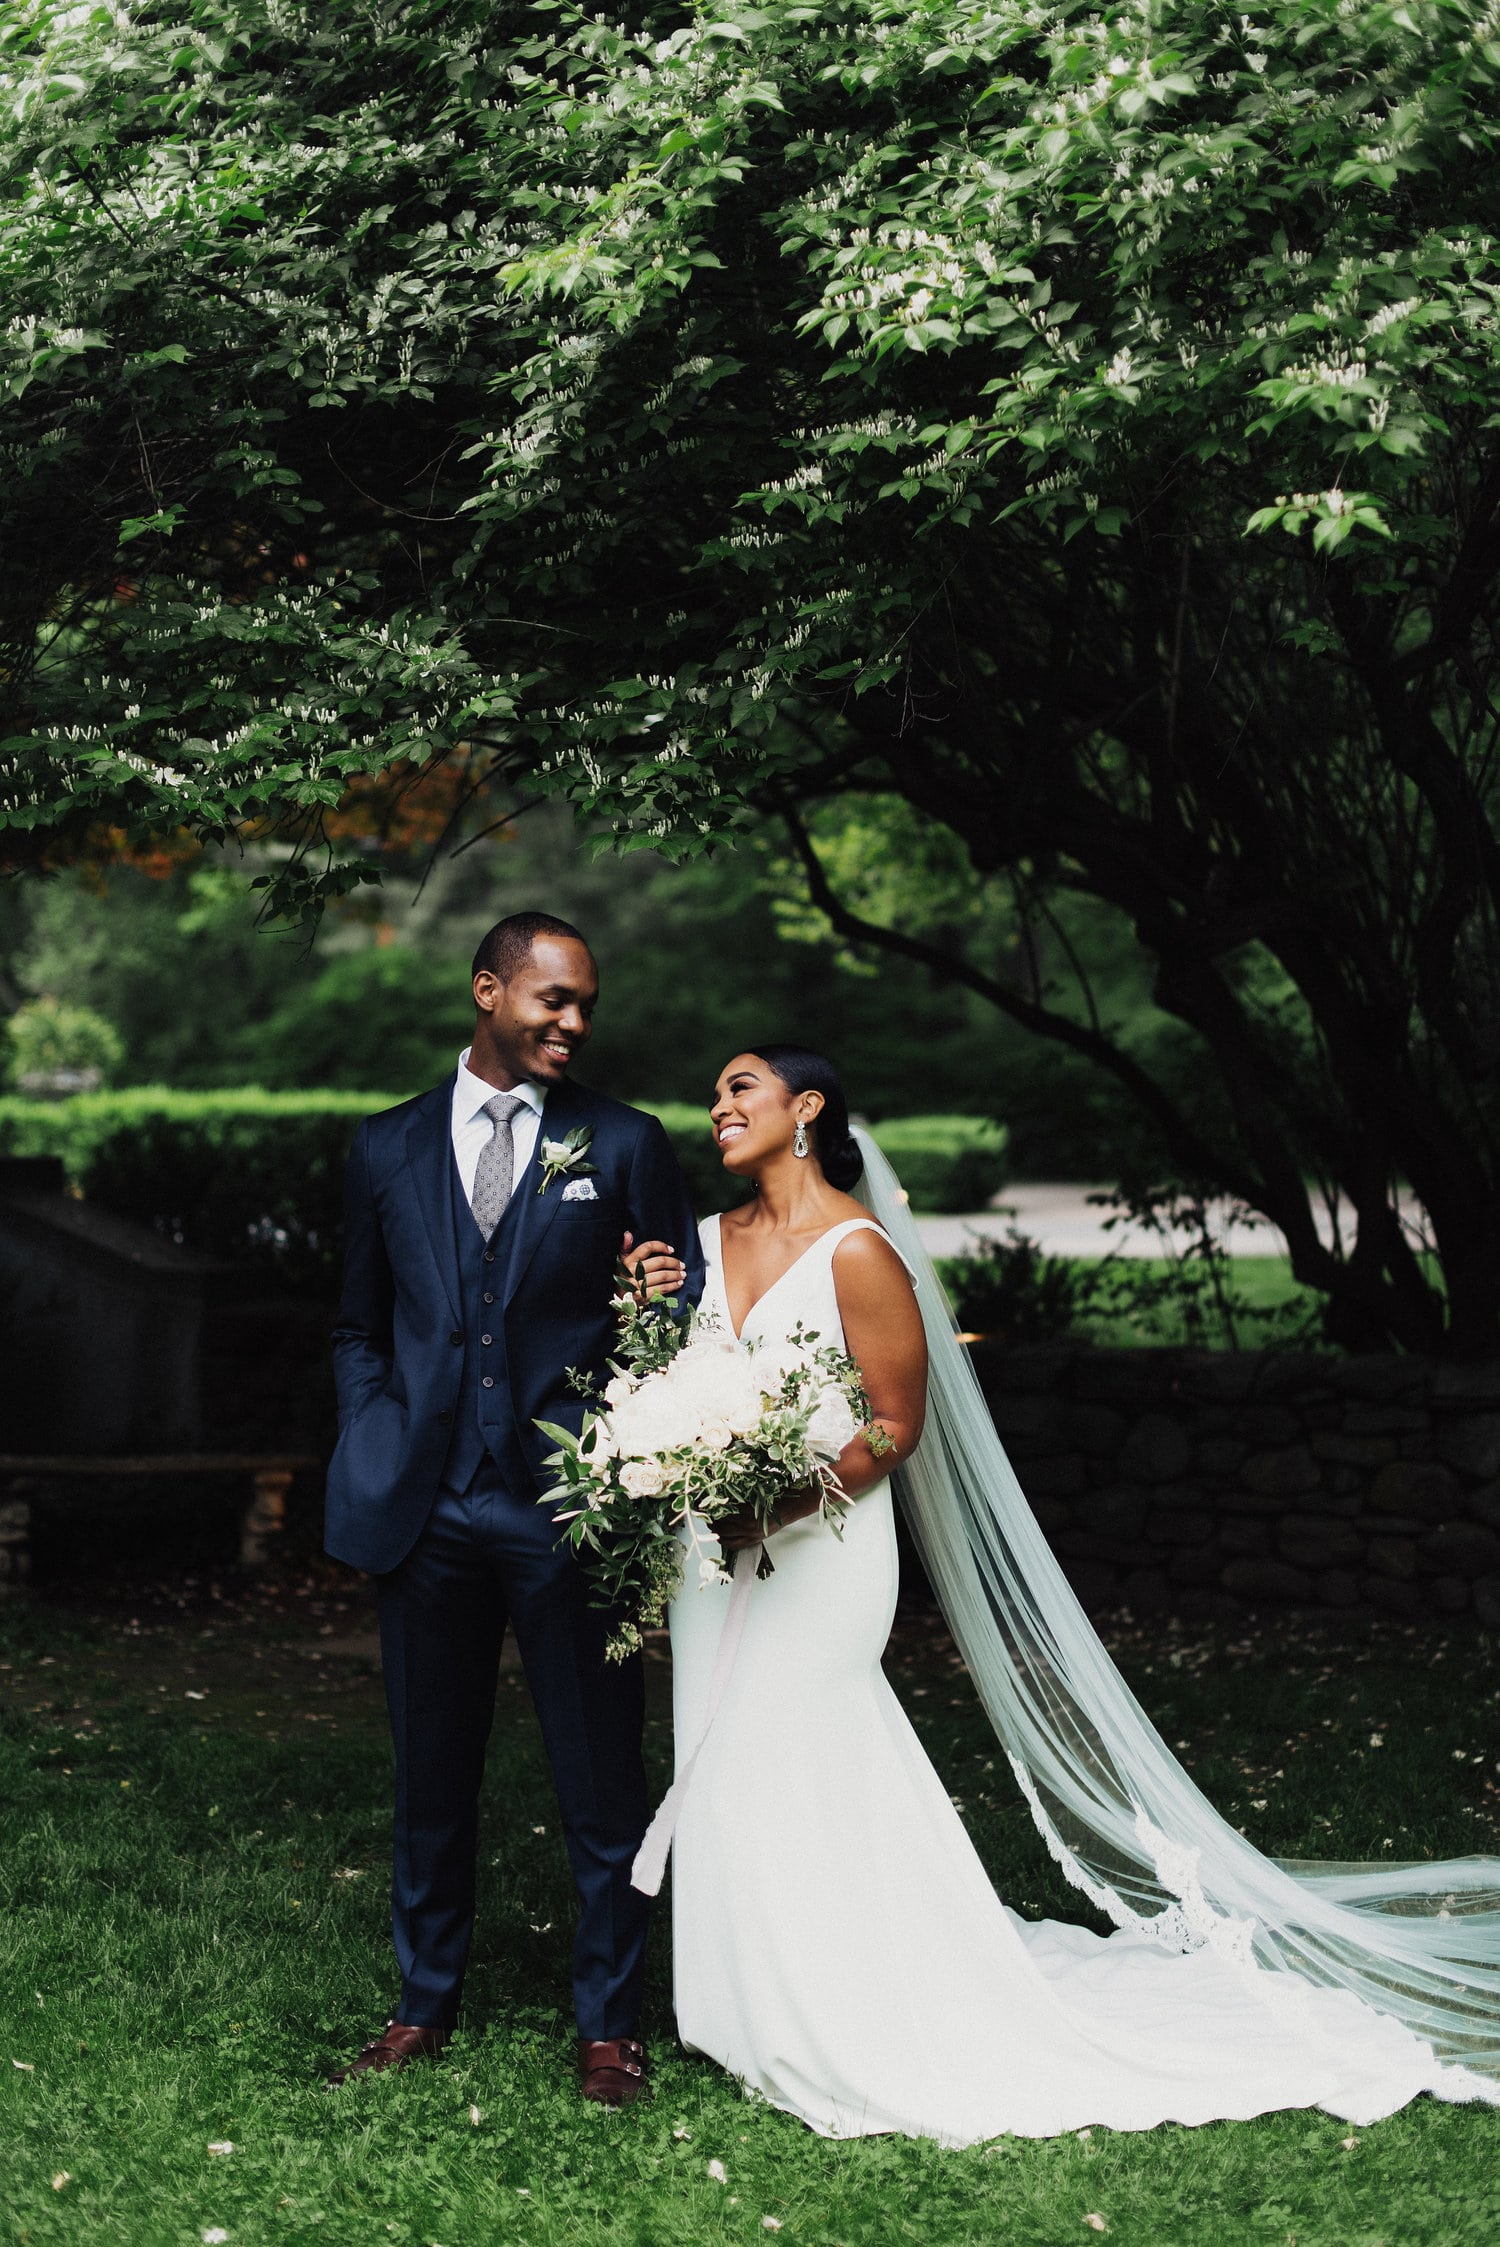 haynes-wedding-edenstraderphoto-194-min.jpg